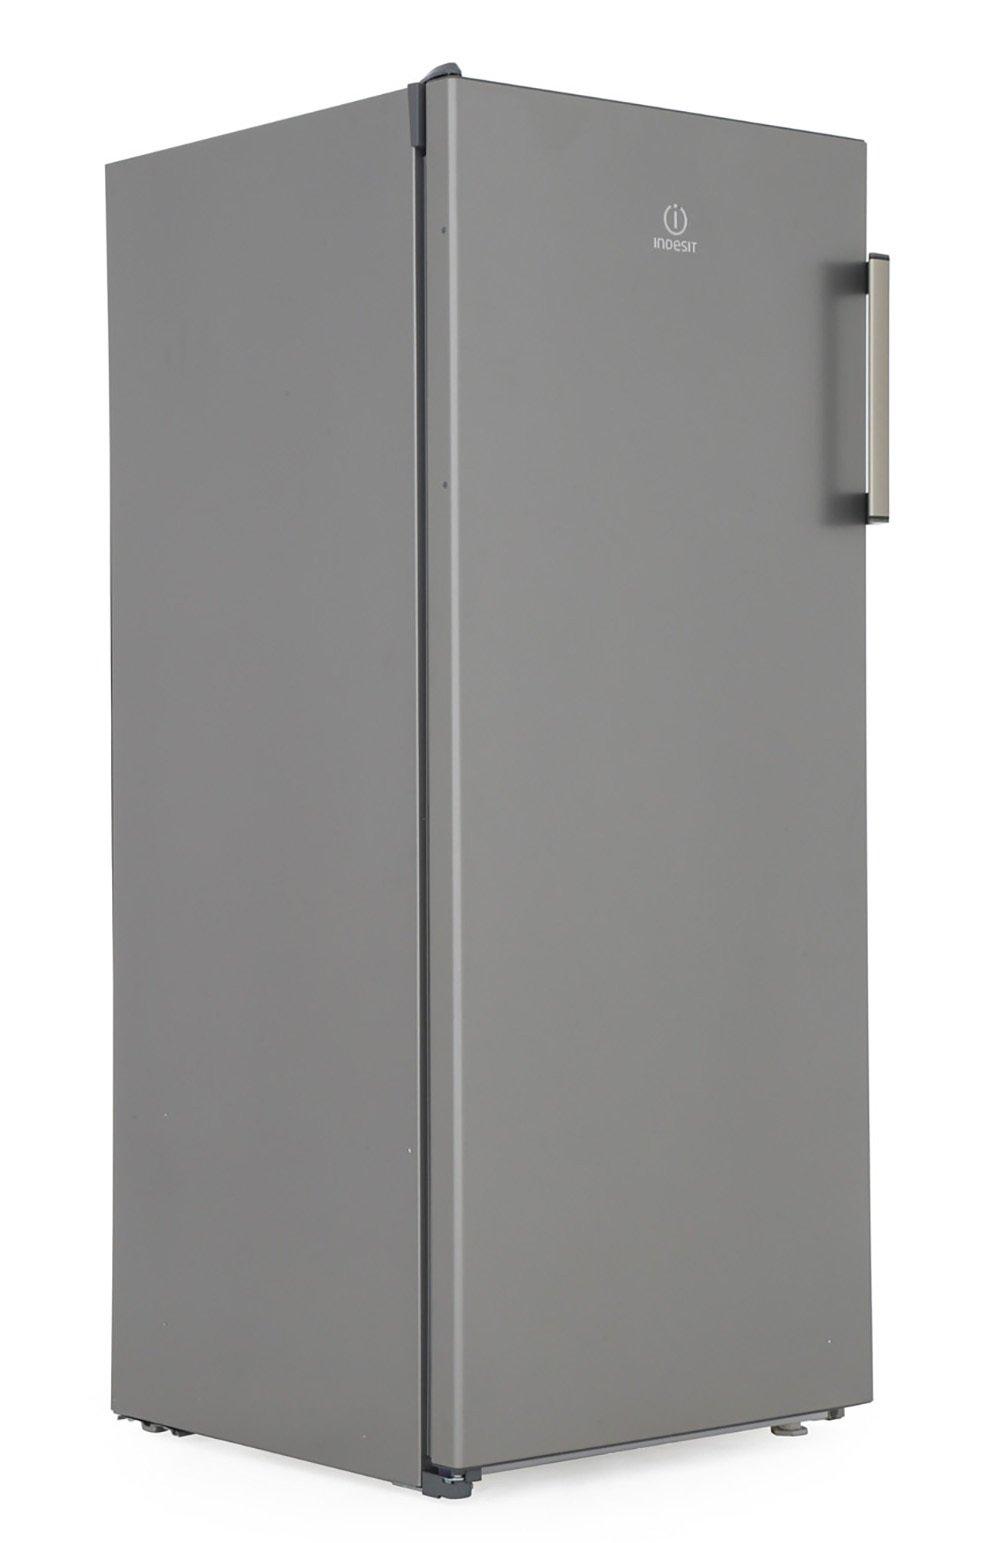 Indesit UI4 1 S UK.1.1 Static Tall Freezer